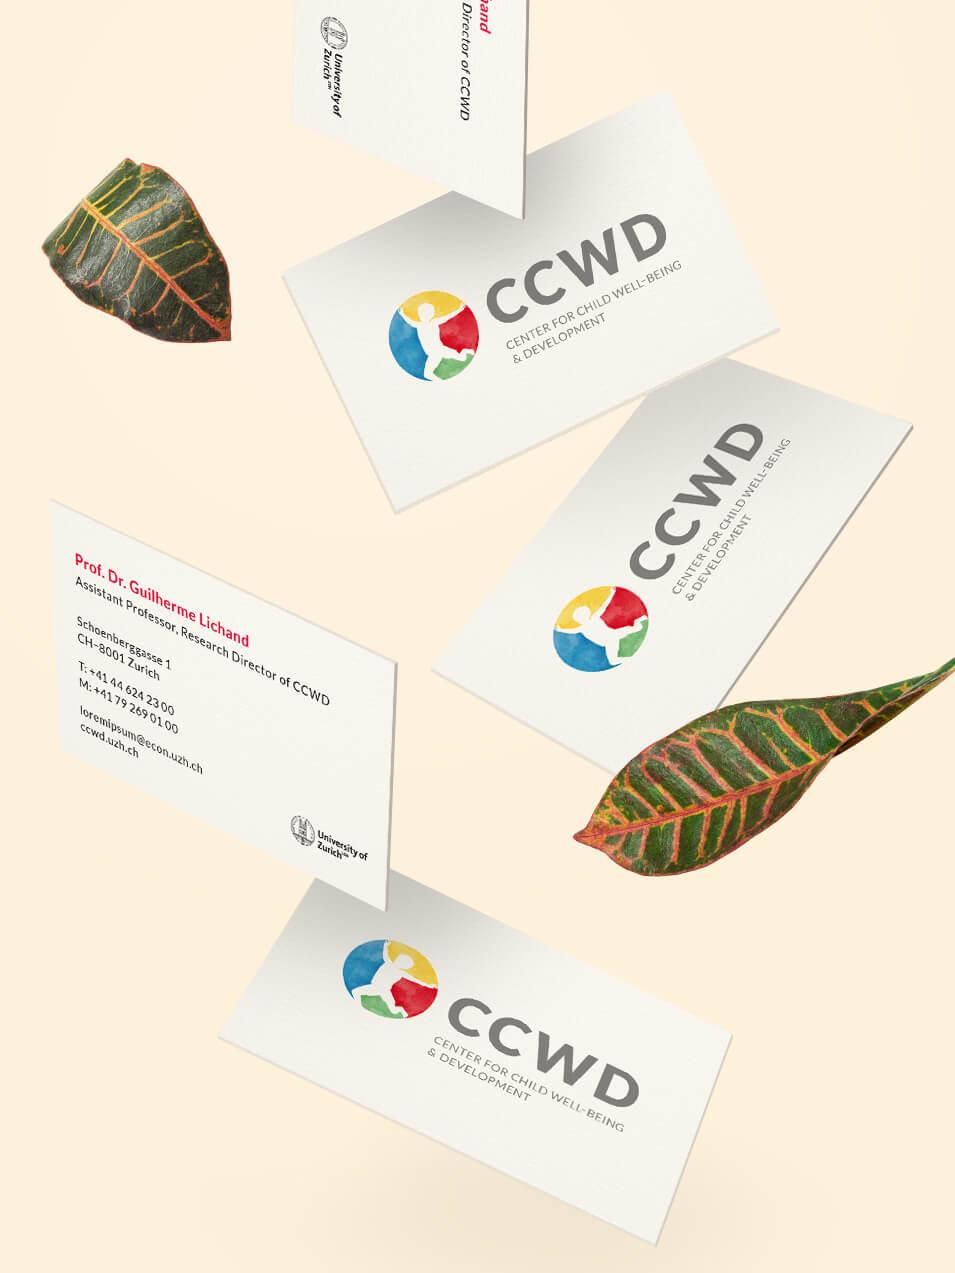 klar-agency_ccwd_vk.jpg